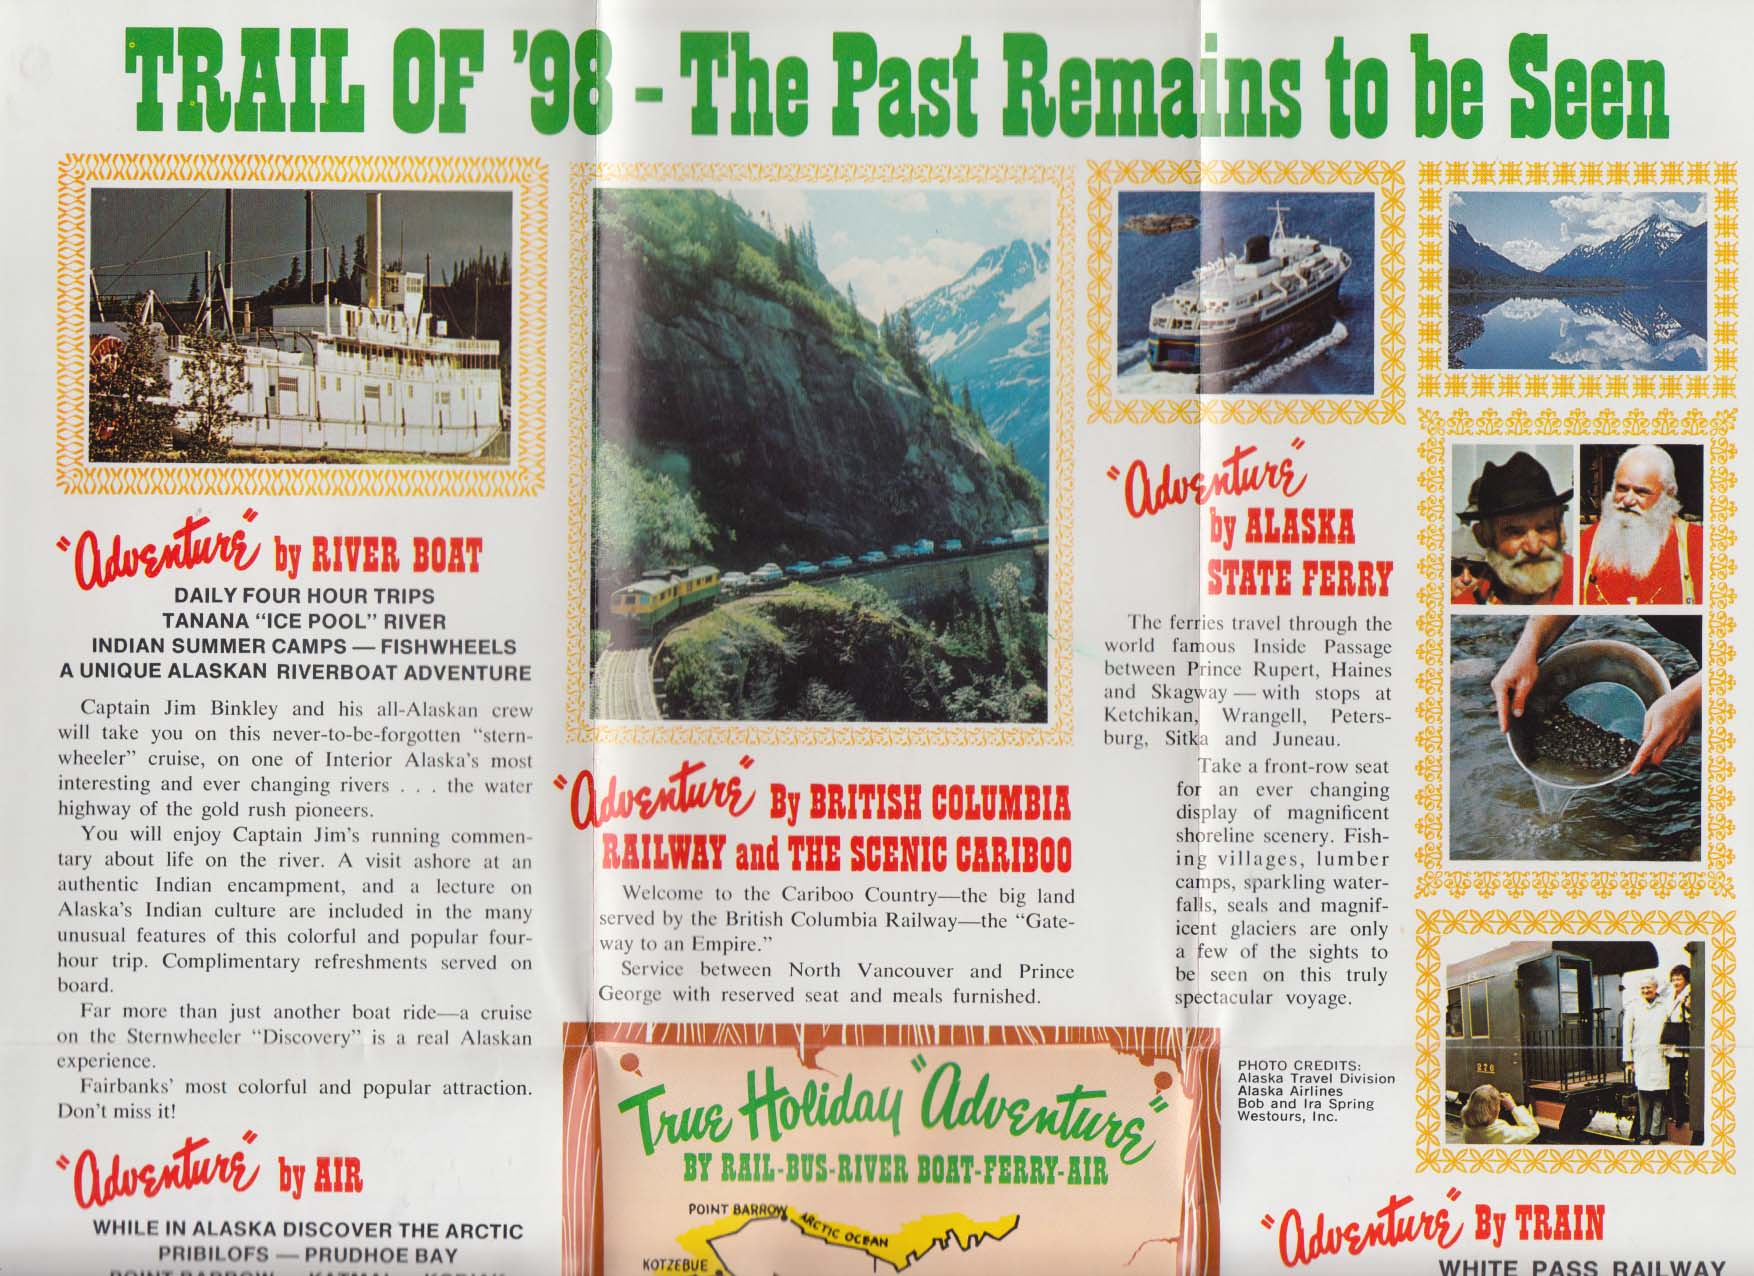 White Pass & Yukon Railroad Alaska & the Yukon schedule 1975